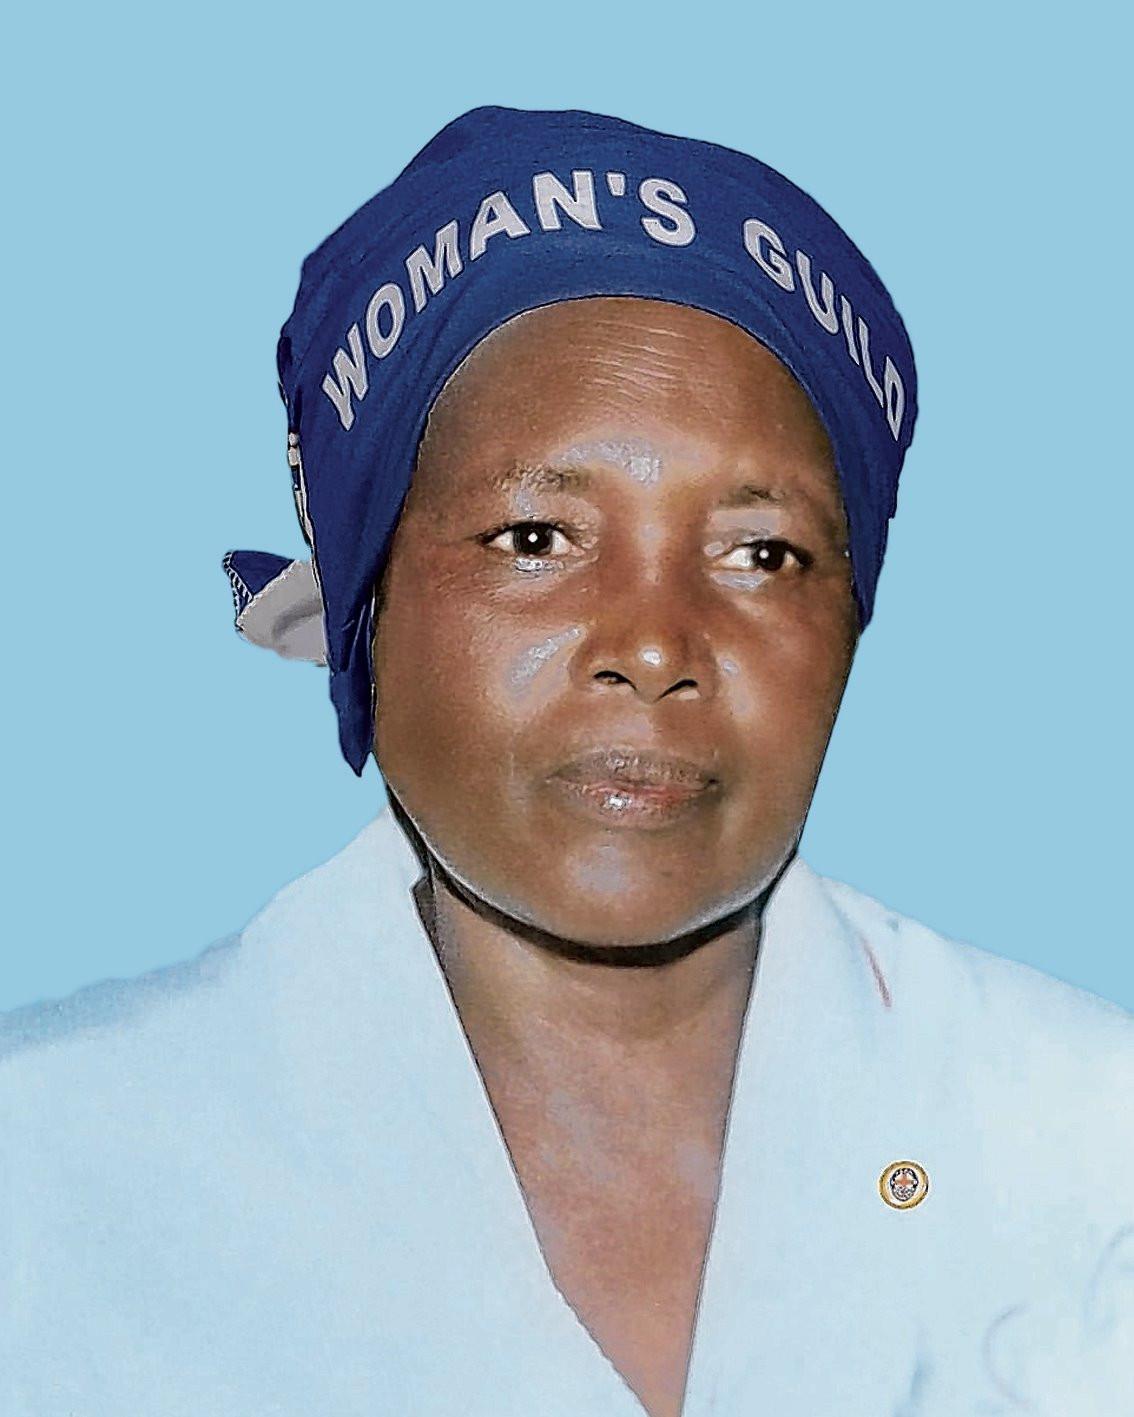 Margaret Wangui Kinyanjui